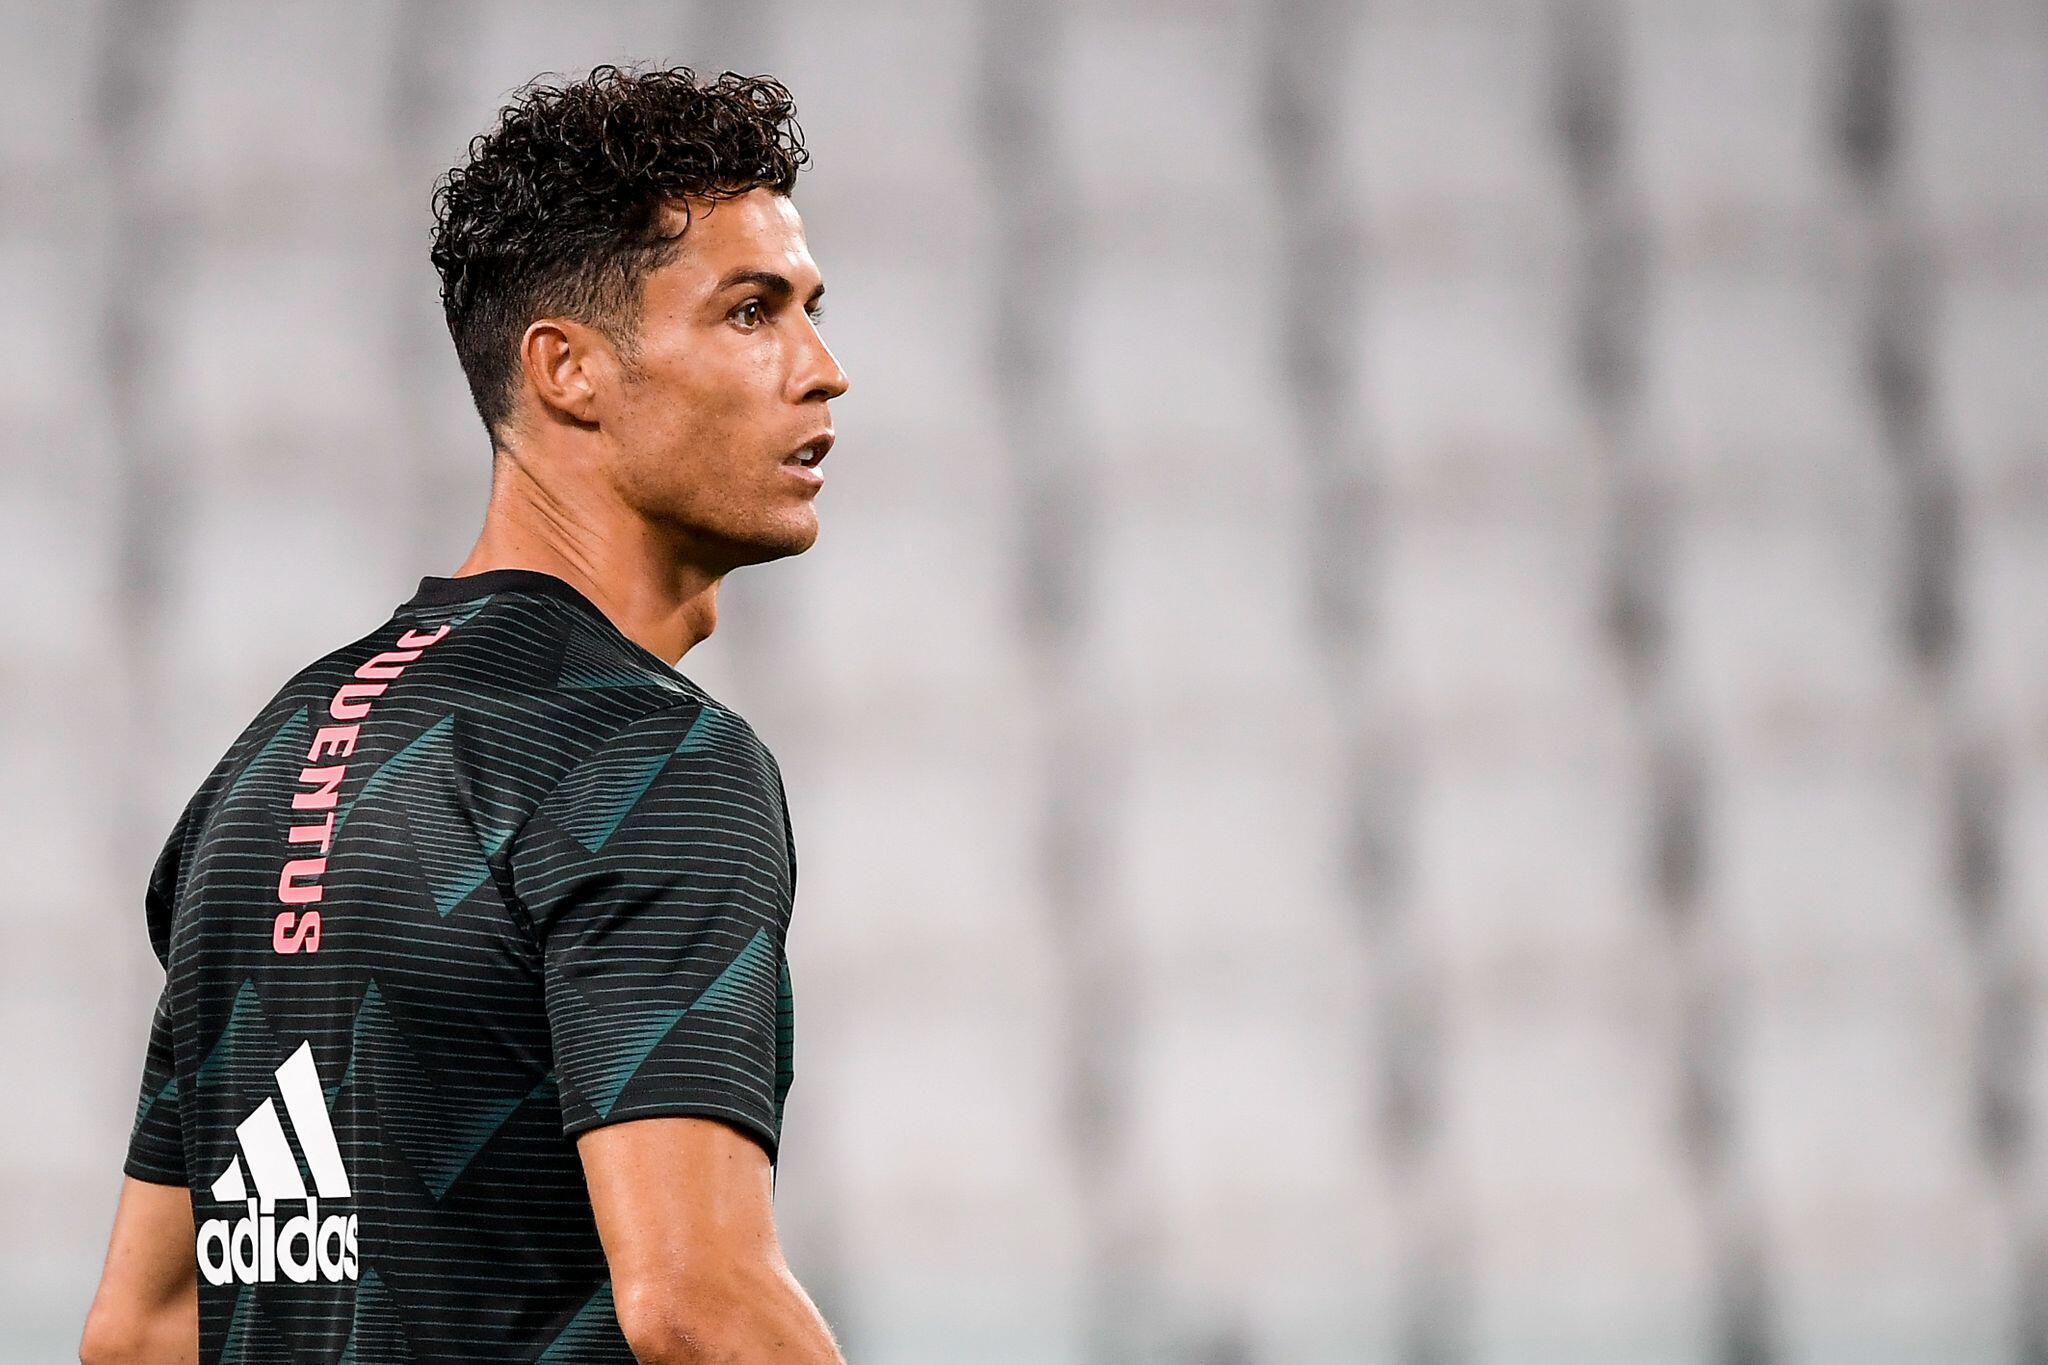 Bild zu Fussball-Superstar Cristiano Ronaldo positiv auf Coronavirus